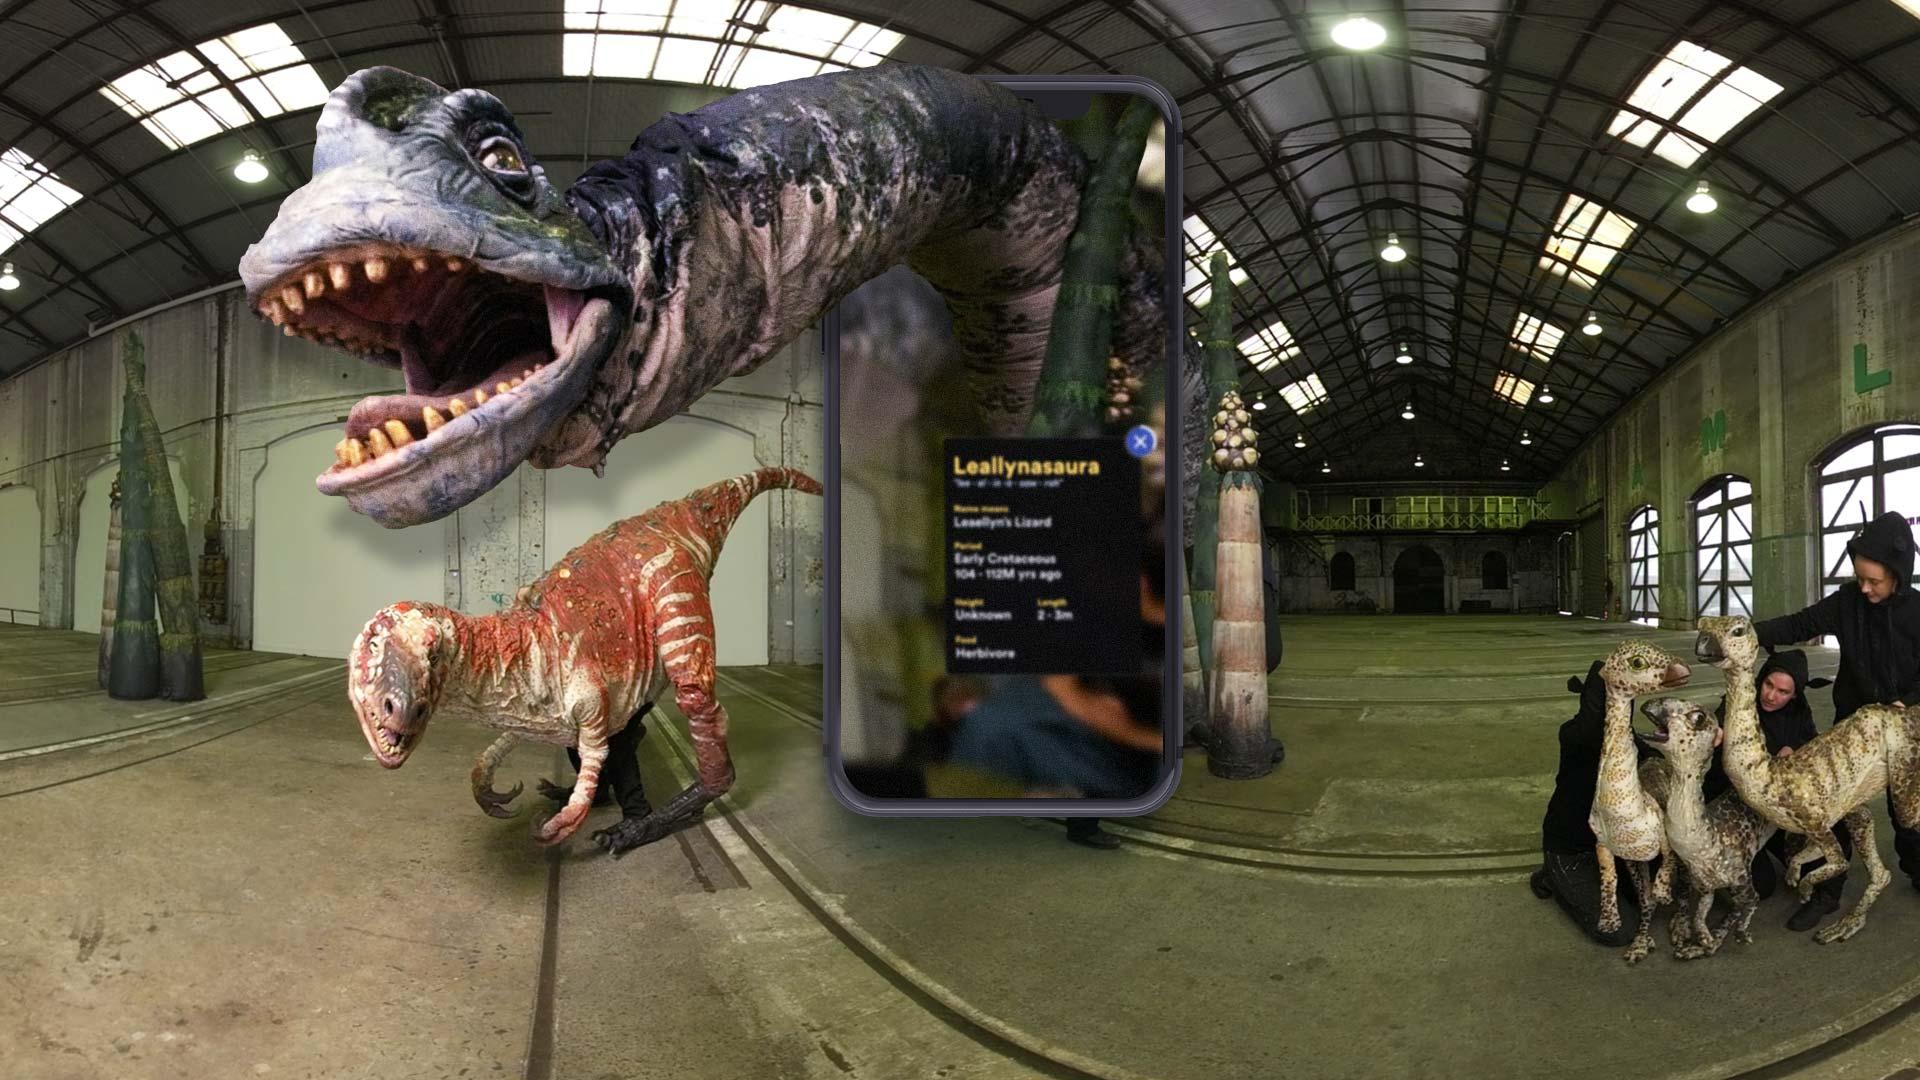 Digital Dinos by Sydney Opera House and Erth